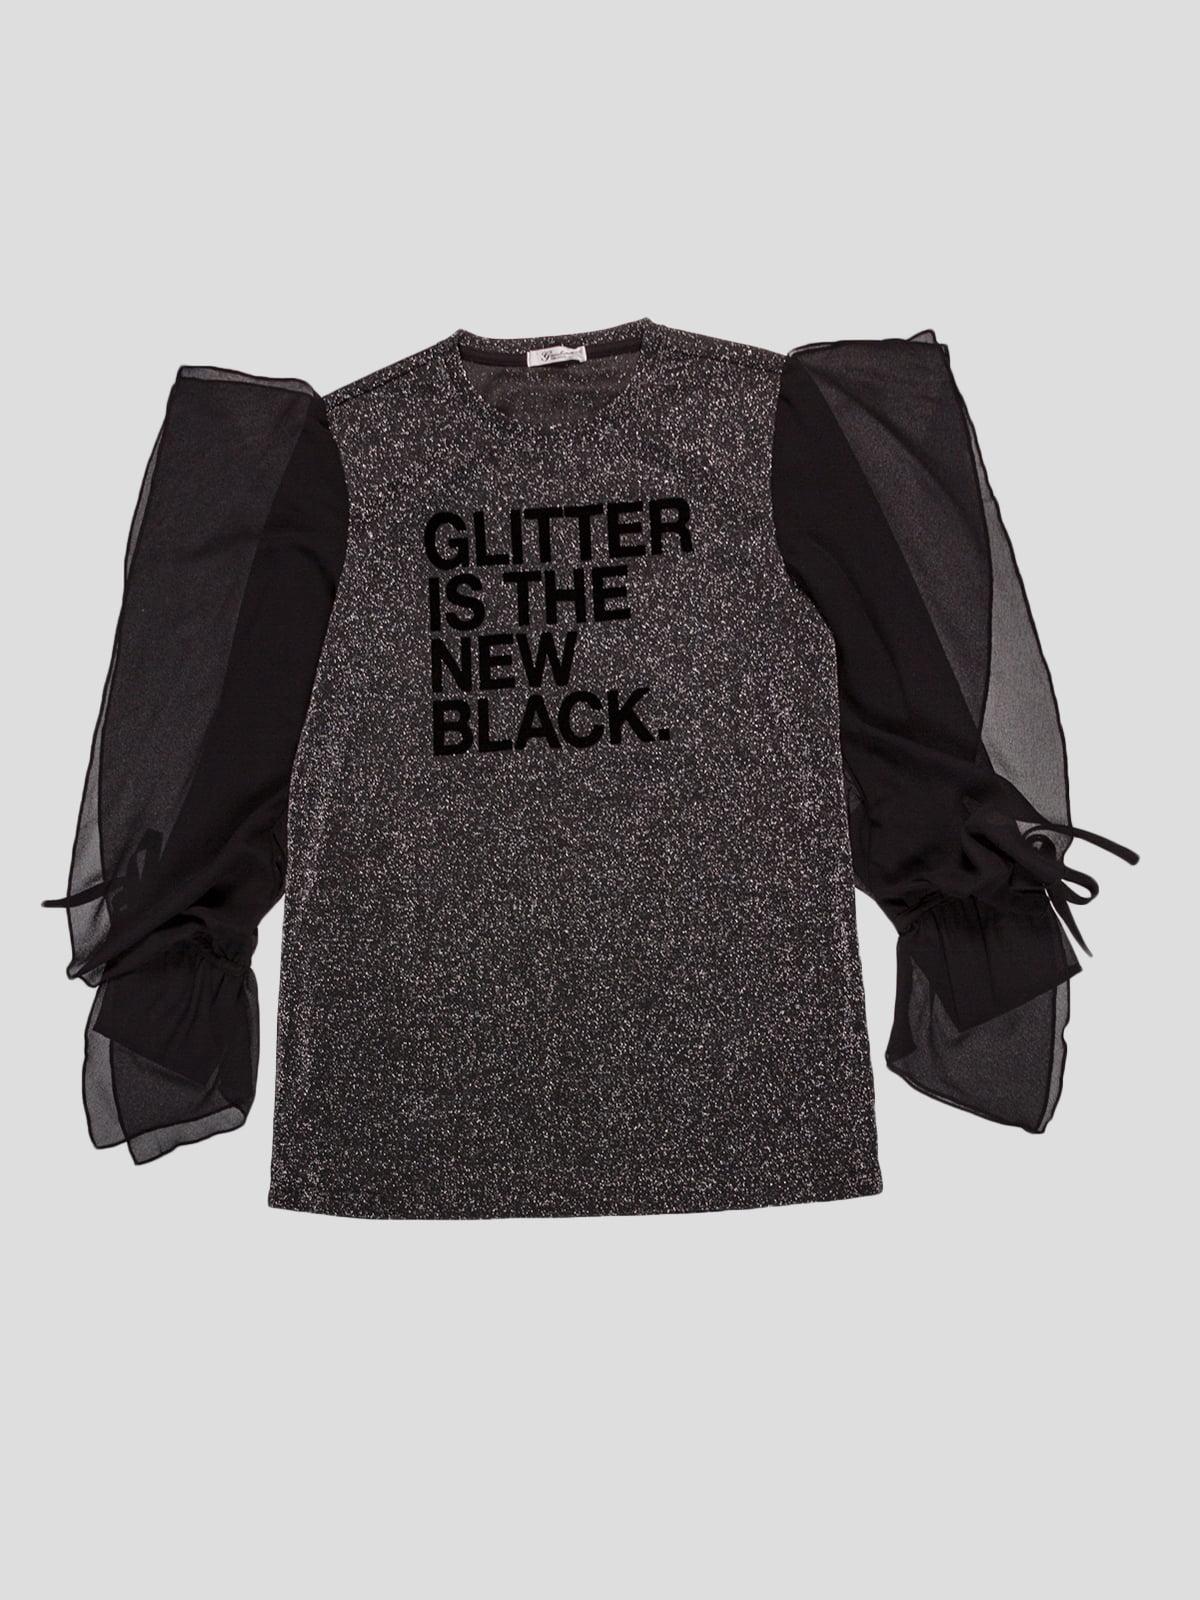 Джемпер чорний меланжевий | 4781568